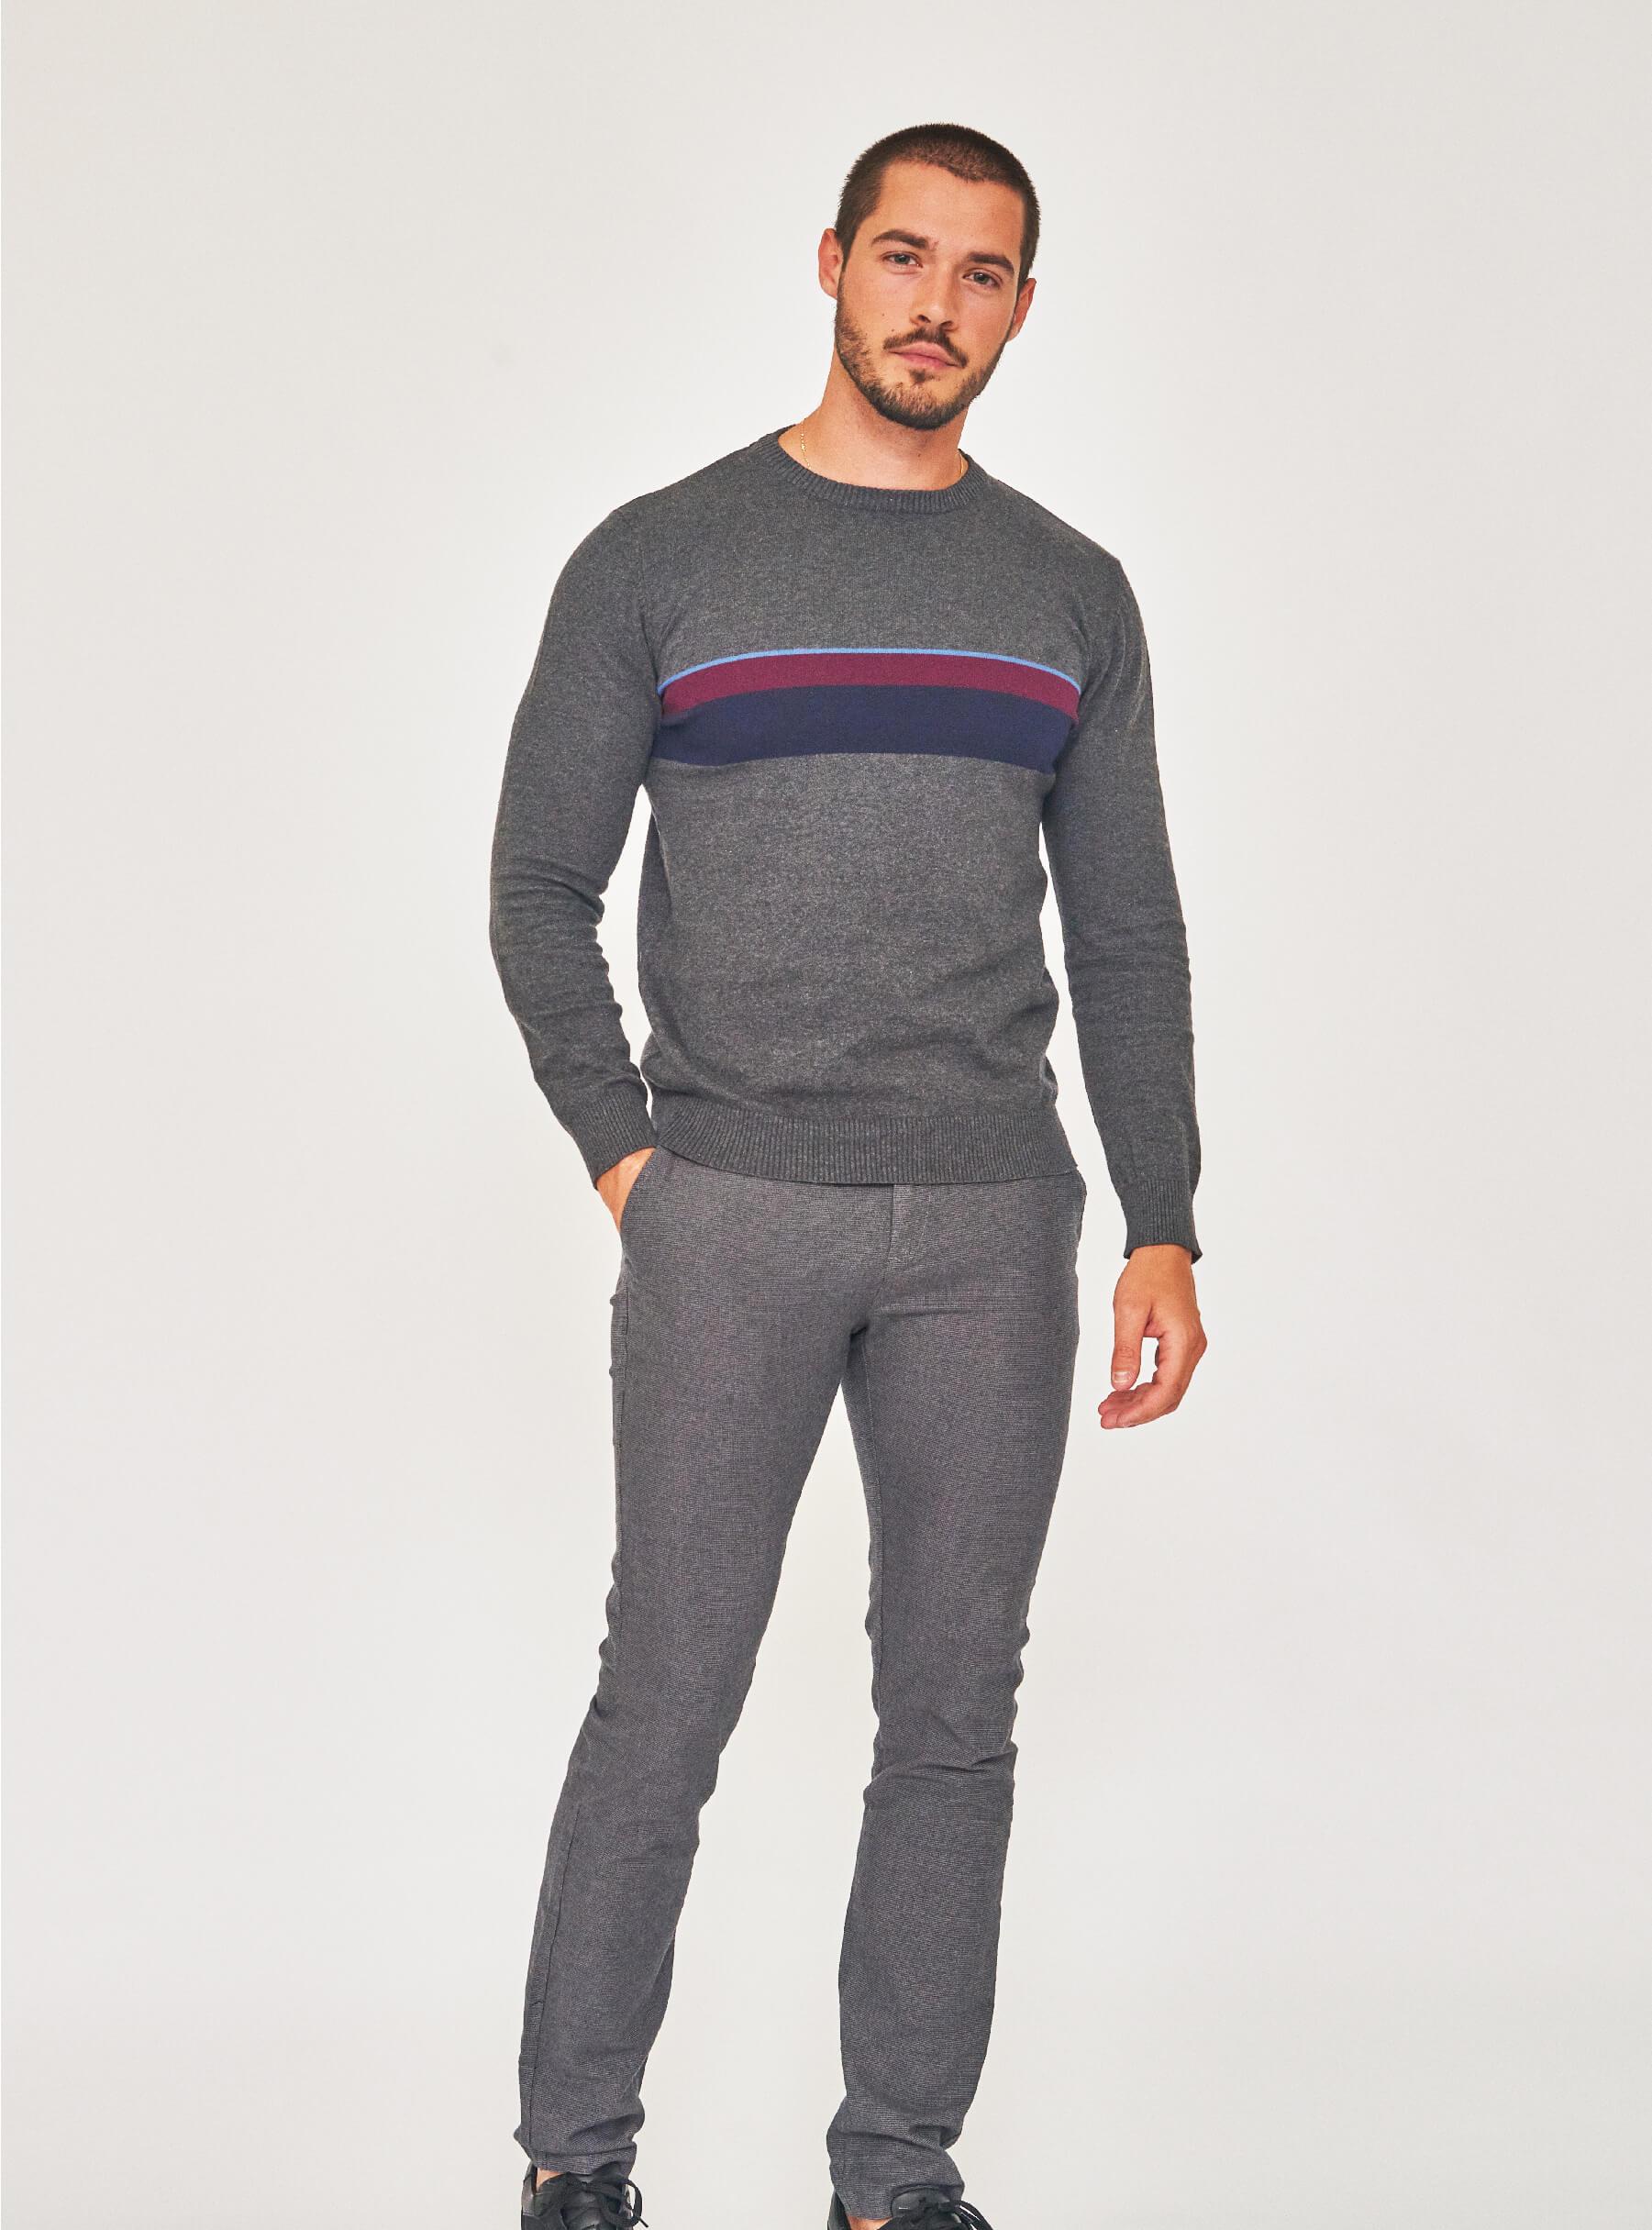 Marx hlače 39,99 €  -50%; Marx pulover 29,99 € -50%;